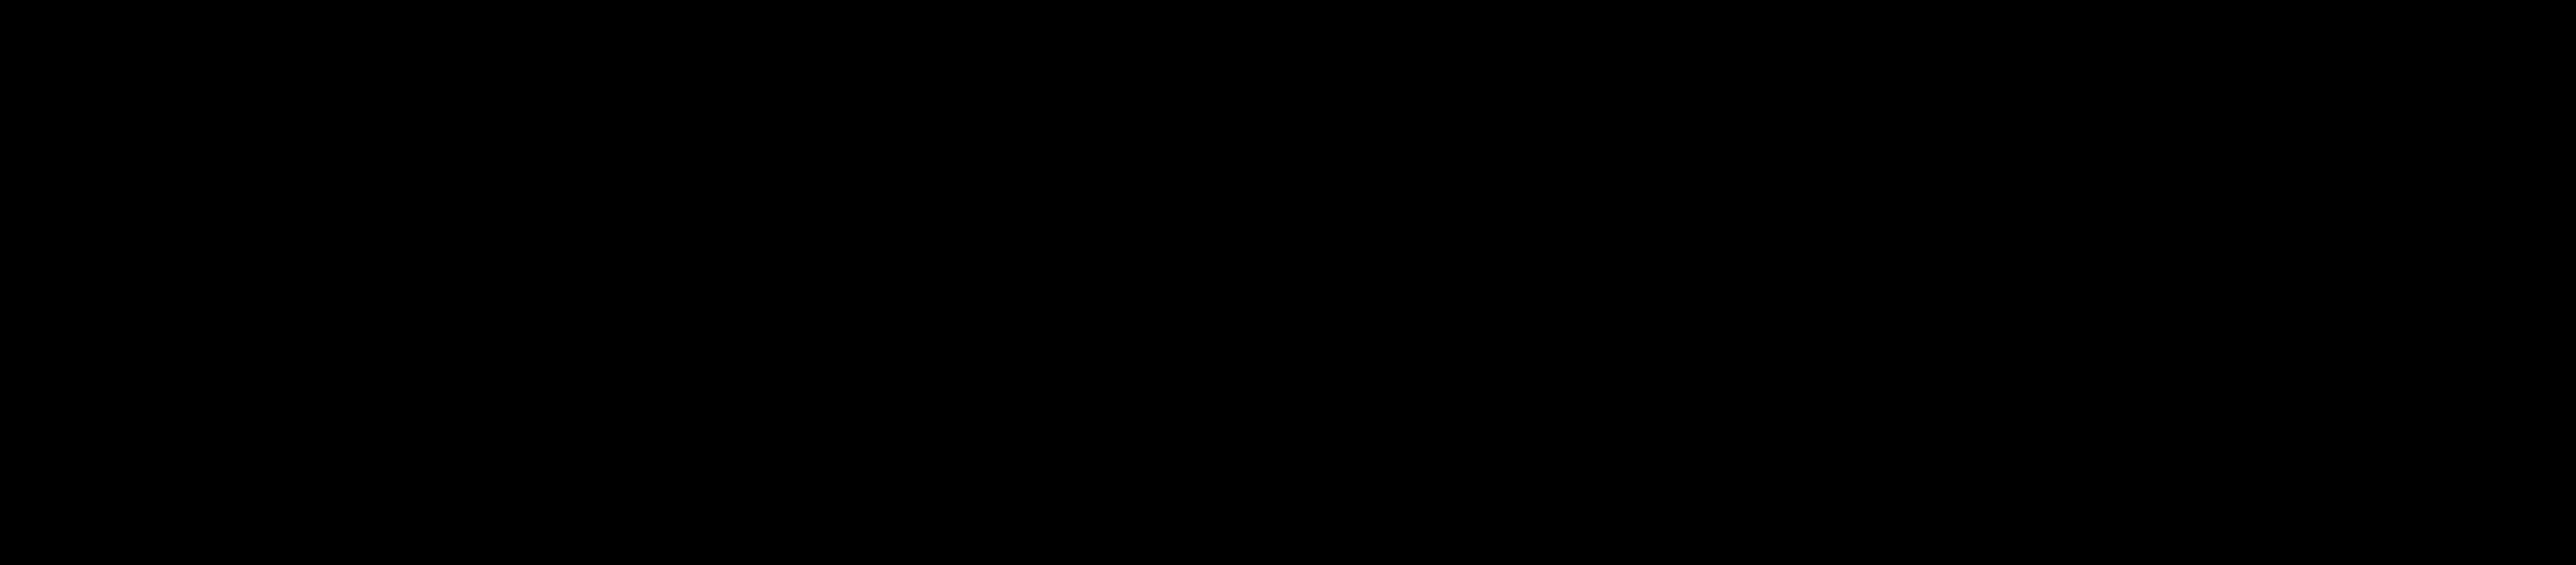 Pin By Healthy Happy On Lovesquad Com Gaming Logos Nintendo Wii Logo Logos